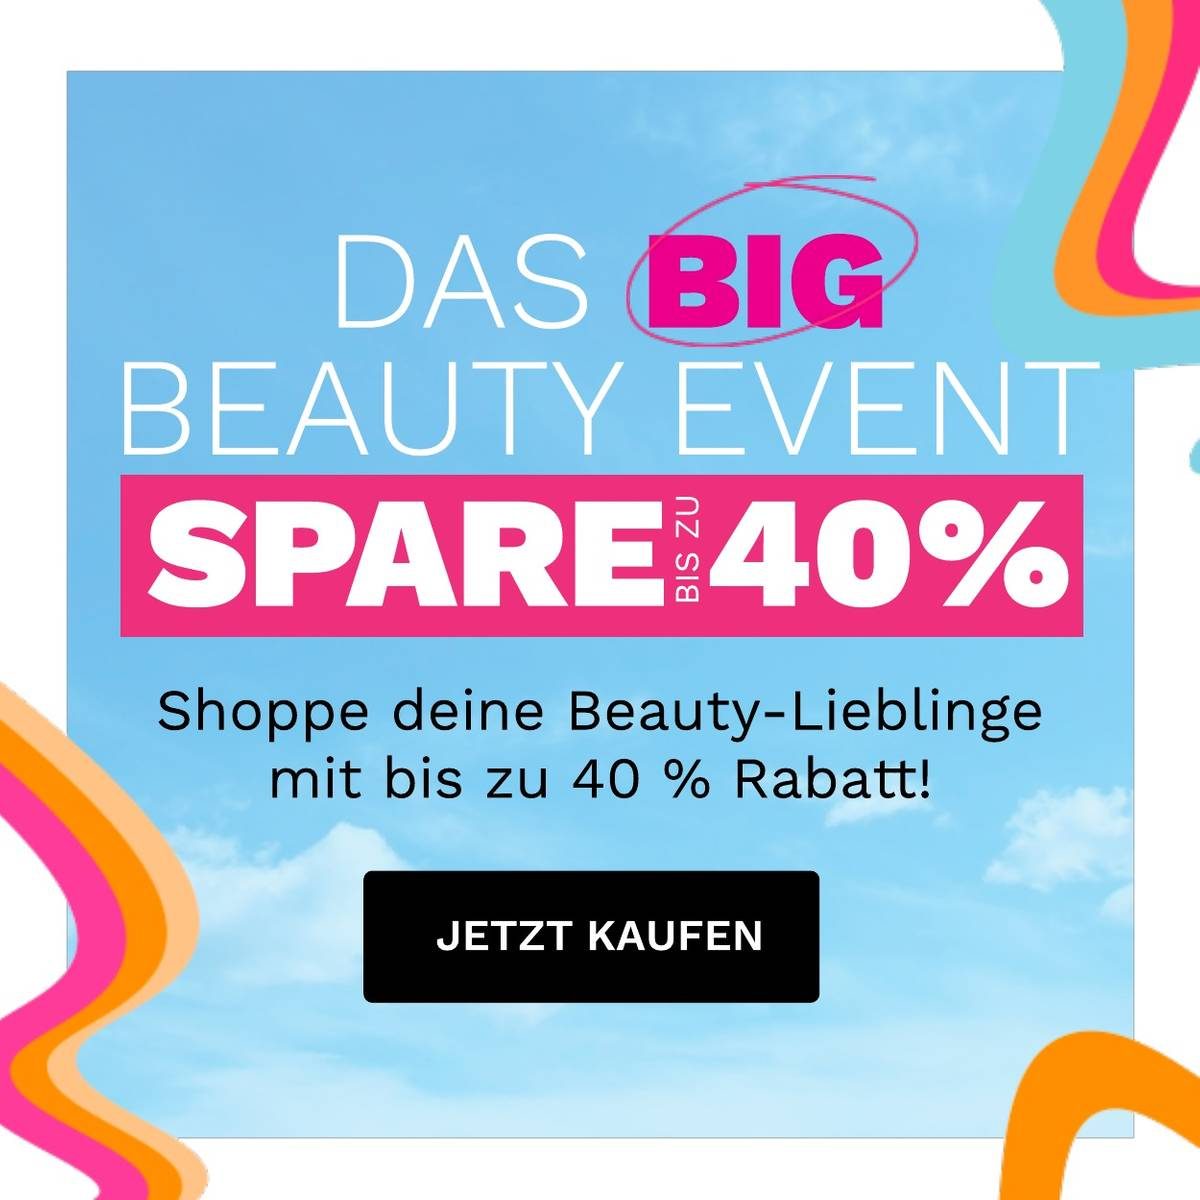 Das Big Beauty Event ist da! Spare bis zu 40 %